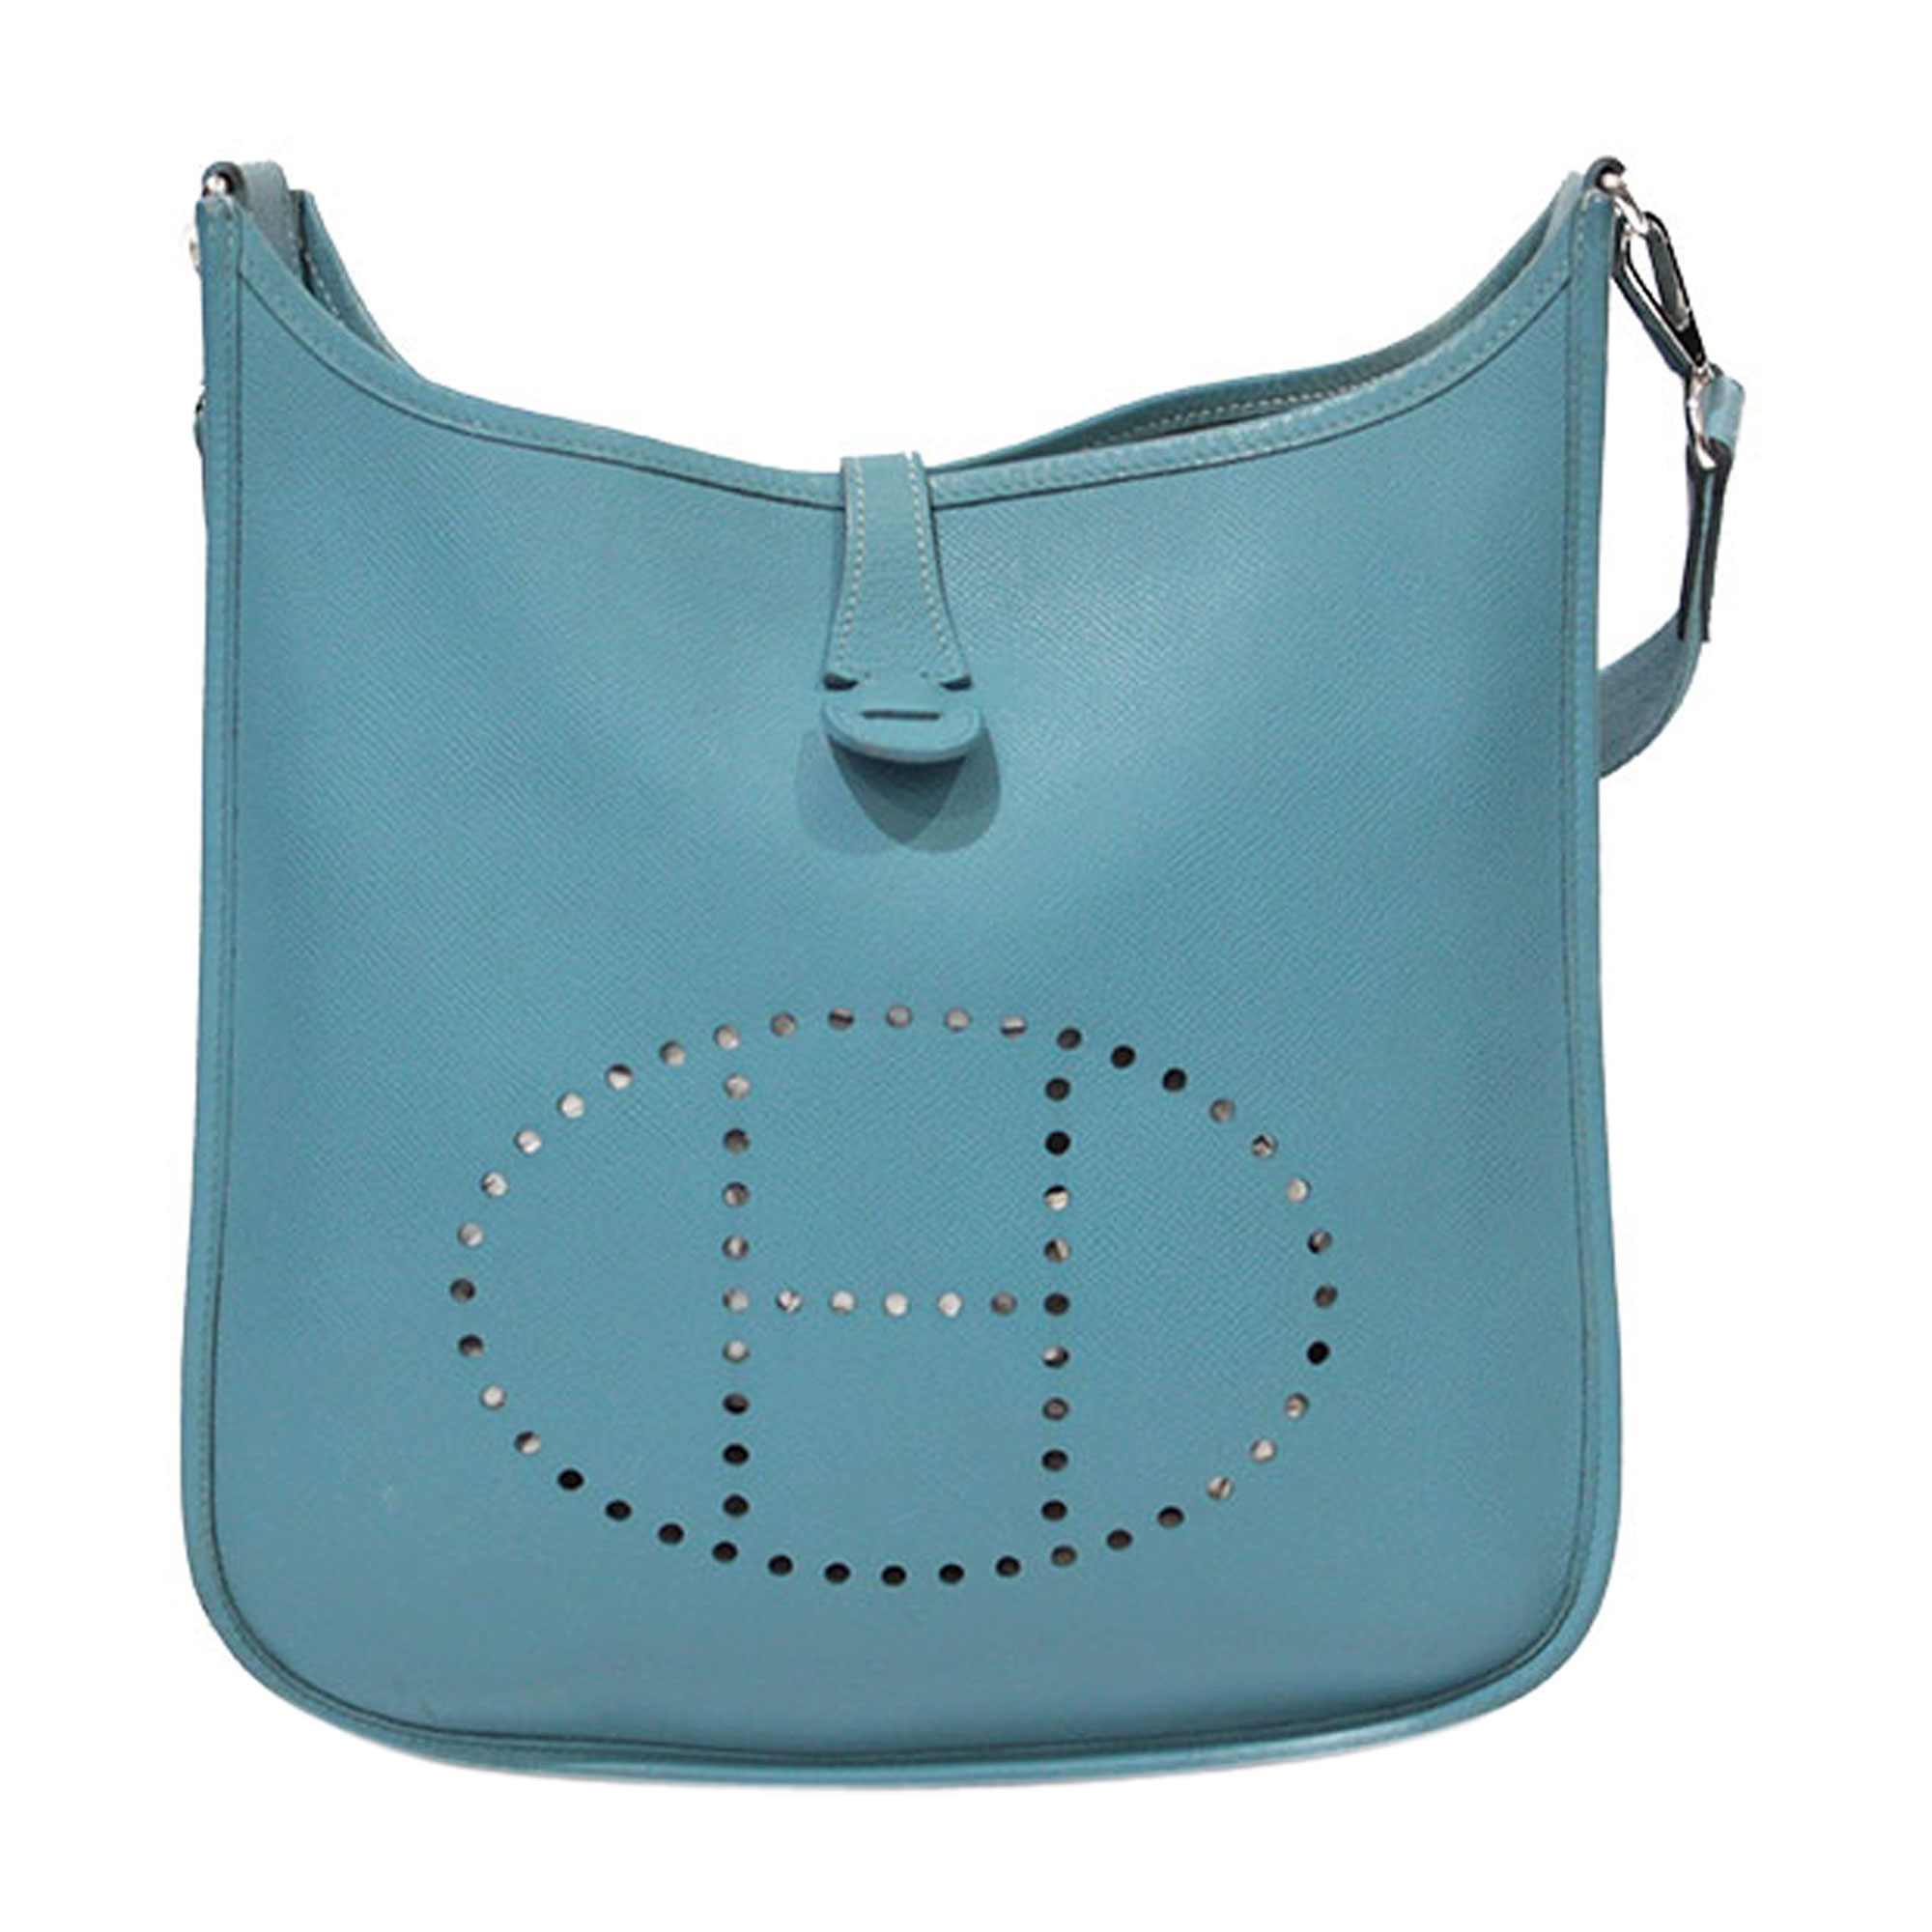 79e8e48c12 Sac en bandoulière en cuir HERMÈS Evelyne Bleu, bleu marine, bleu turquoise